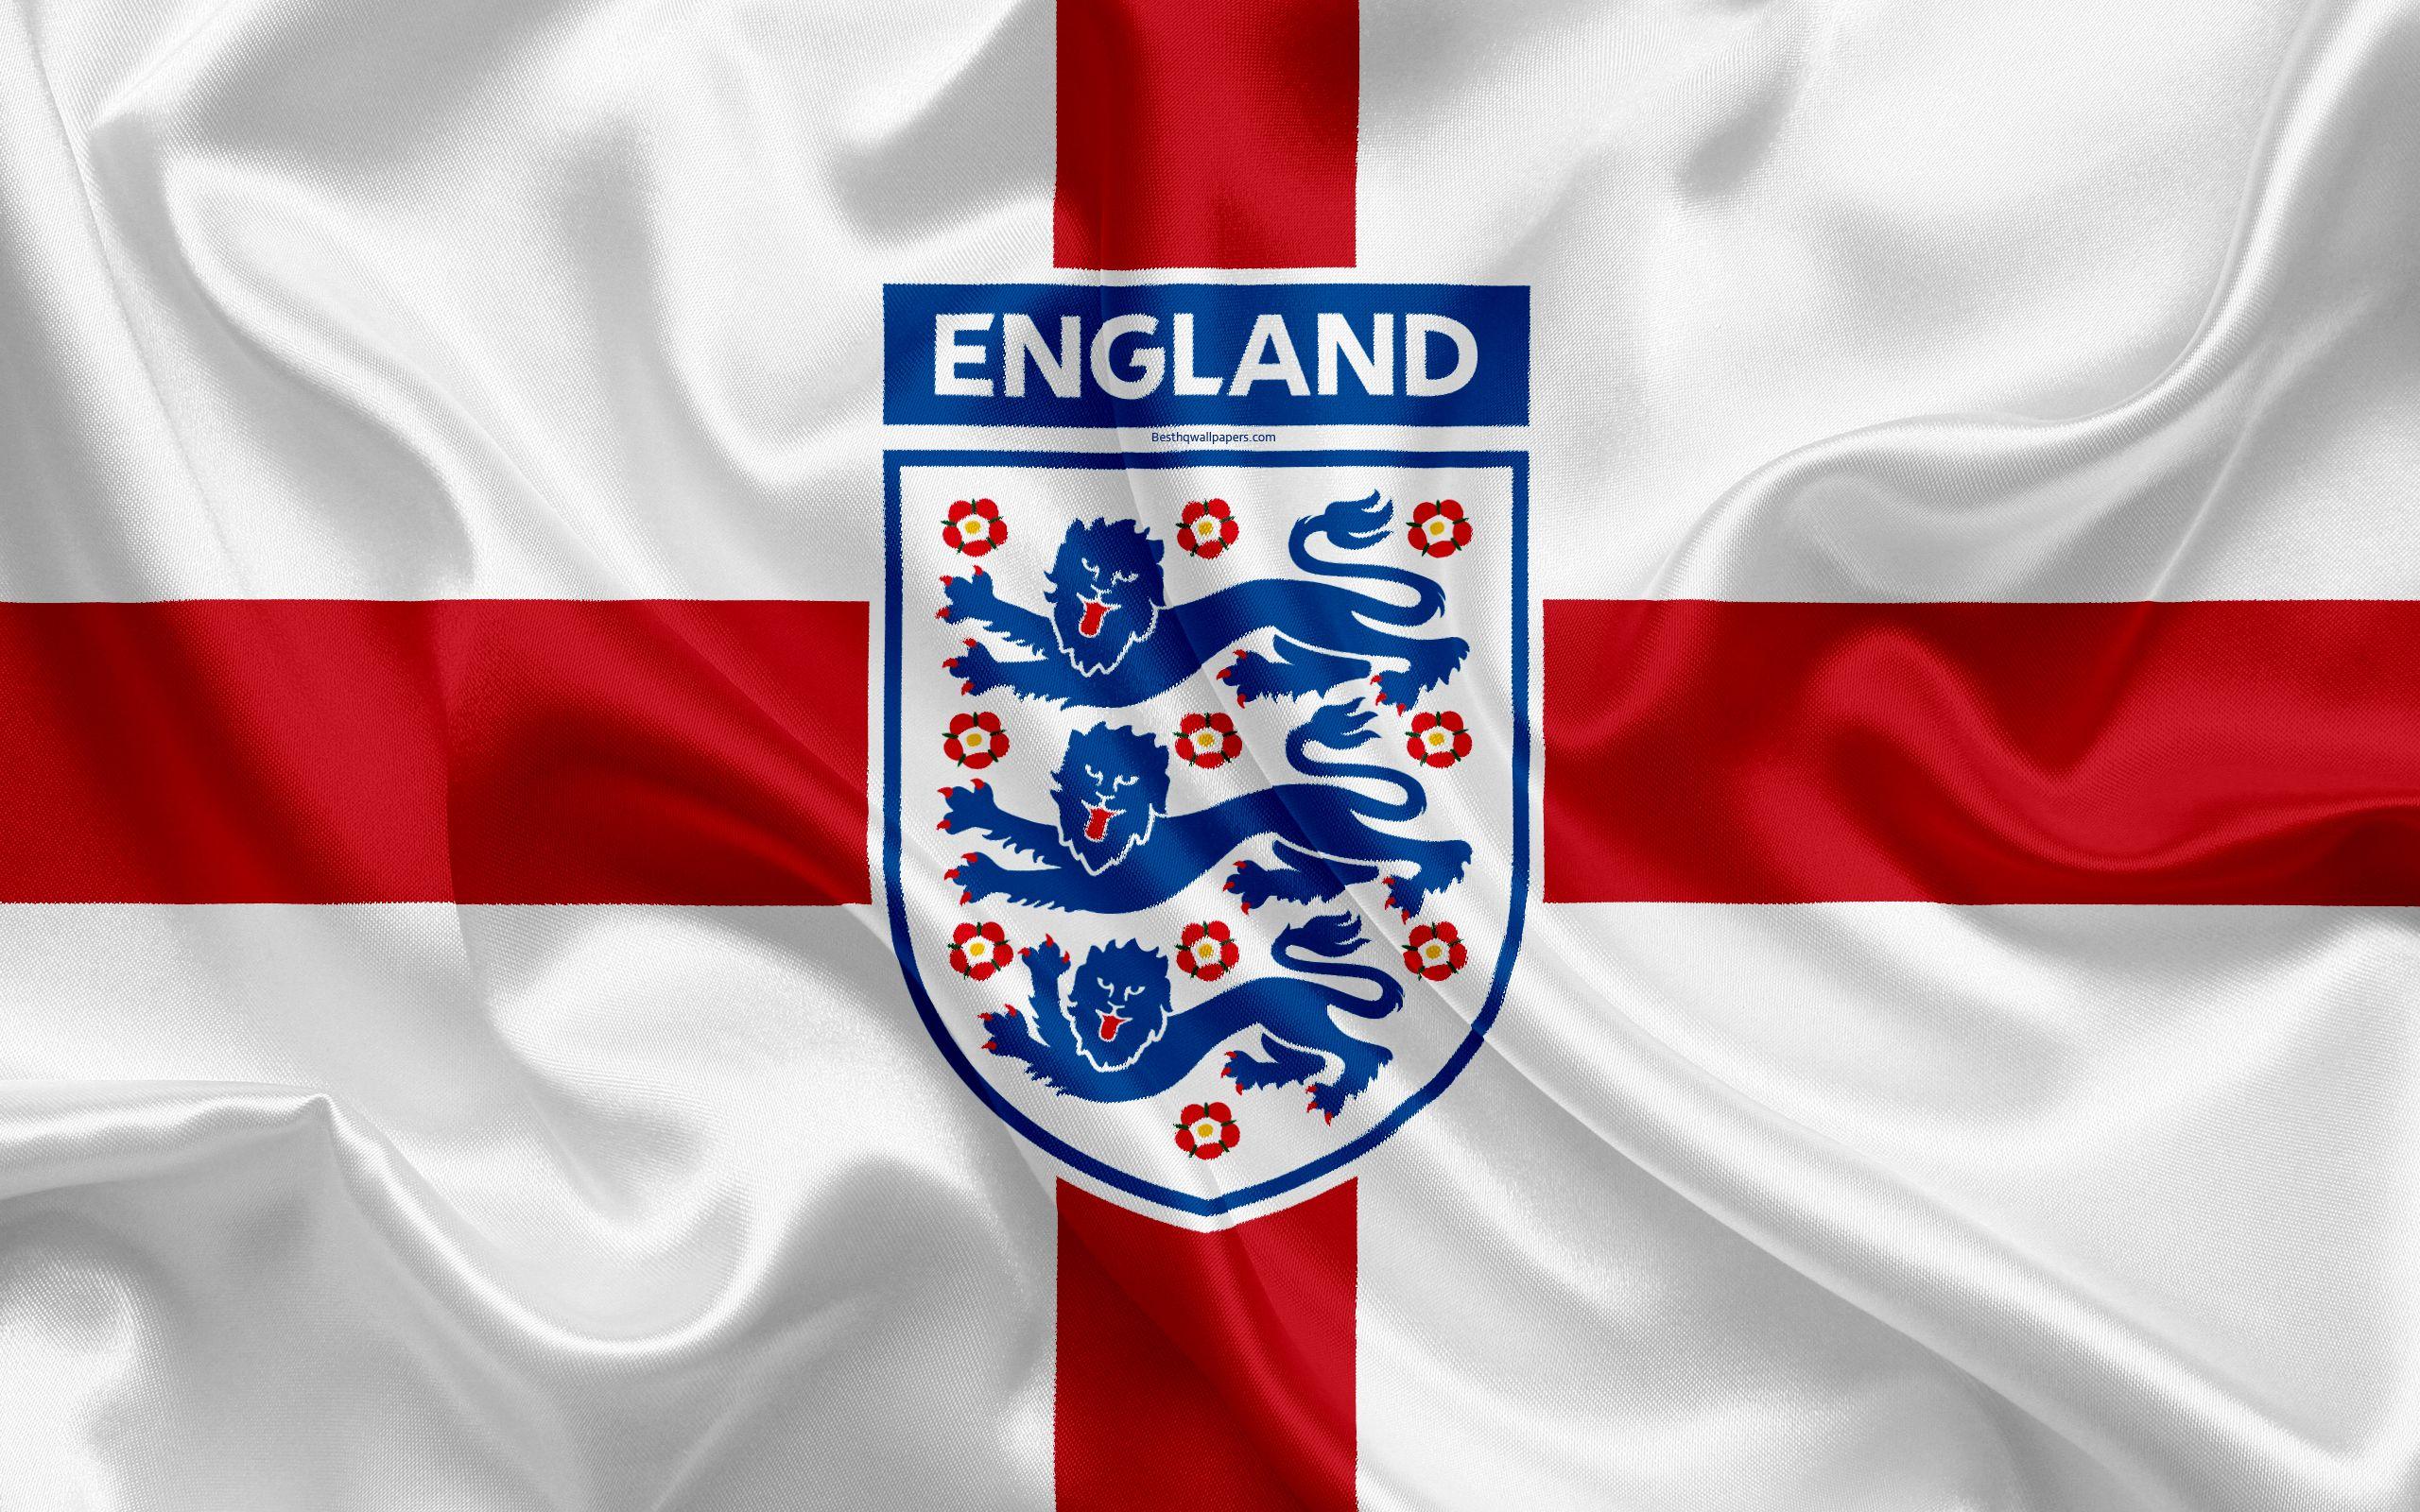 England National Football Team Emblem Logo Flag Europe England Flag Football World C England National Football Team England Flag National Football Teams